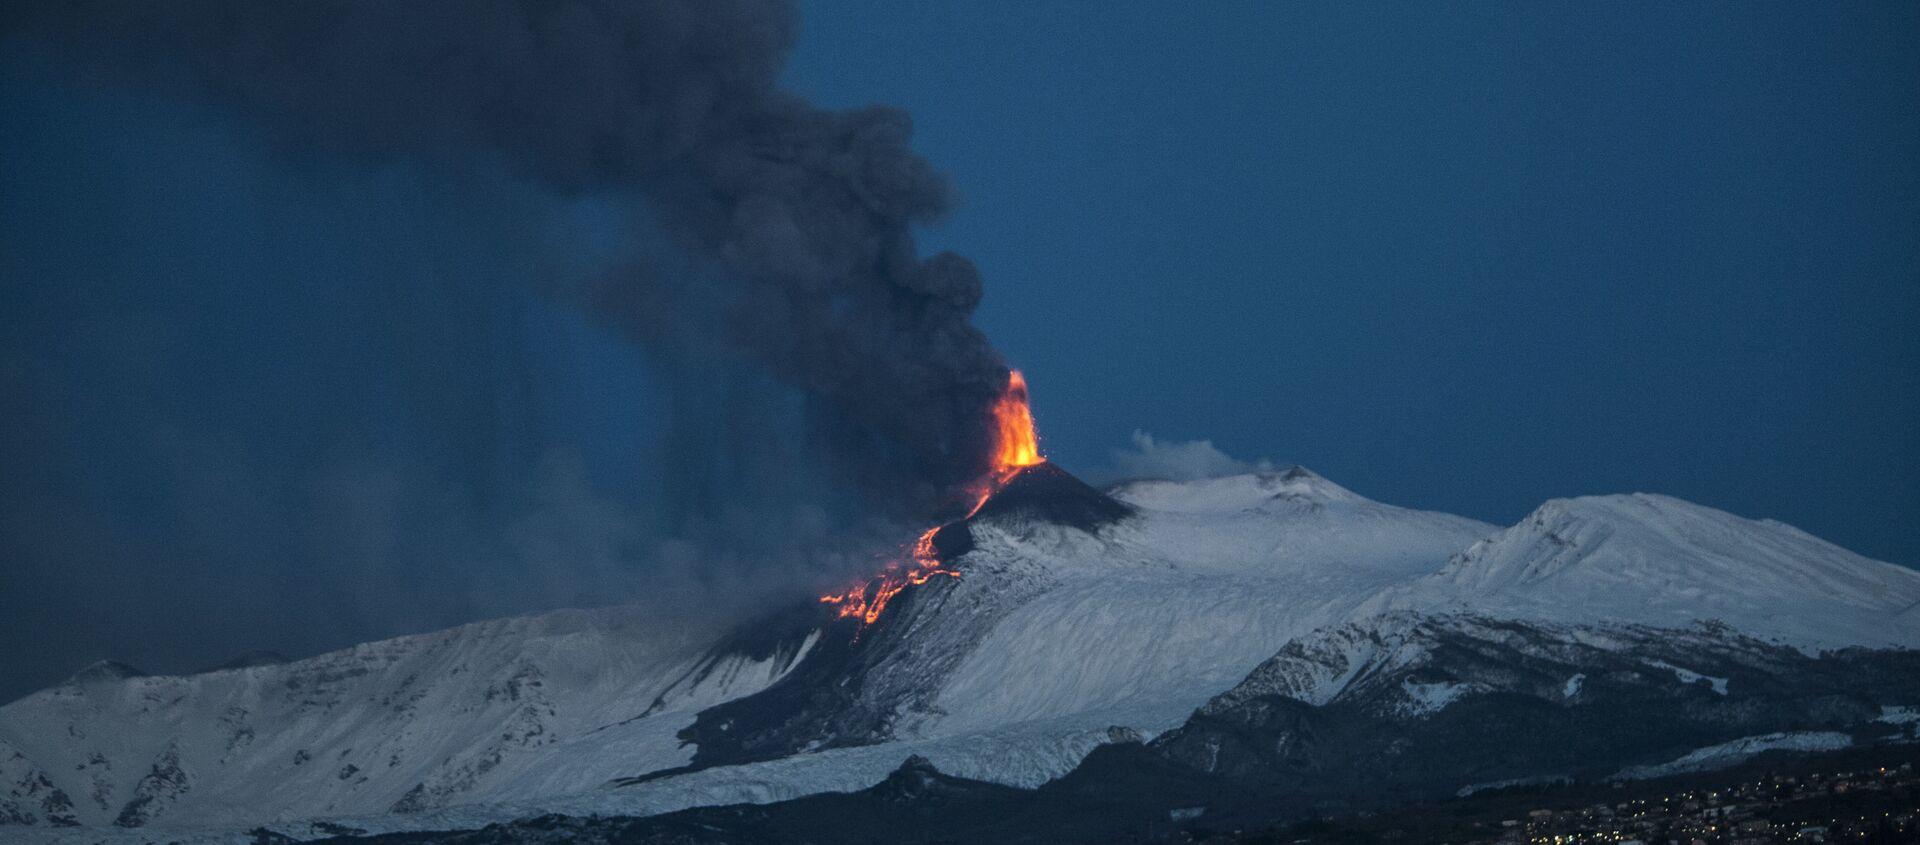 Etna eruzione 24 marzo 2021 - alba - Sputnik Italia, 1920, 24.03.2021